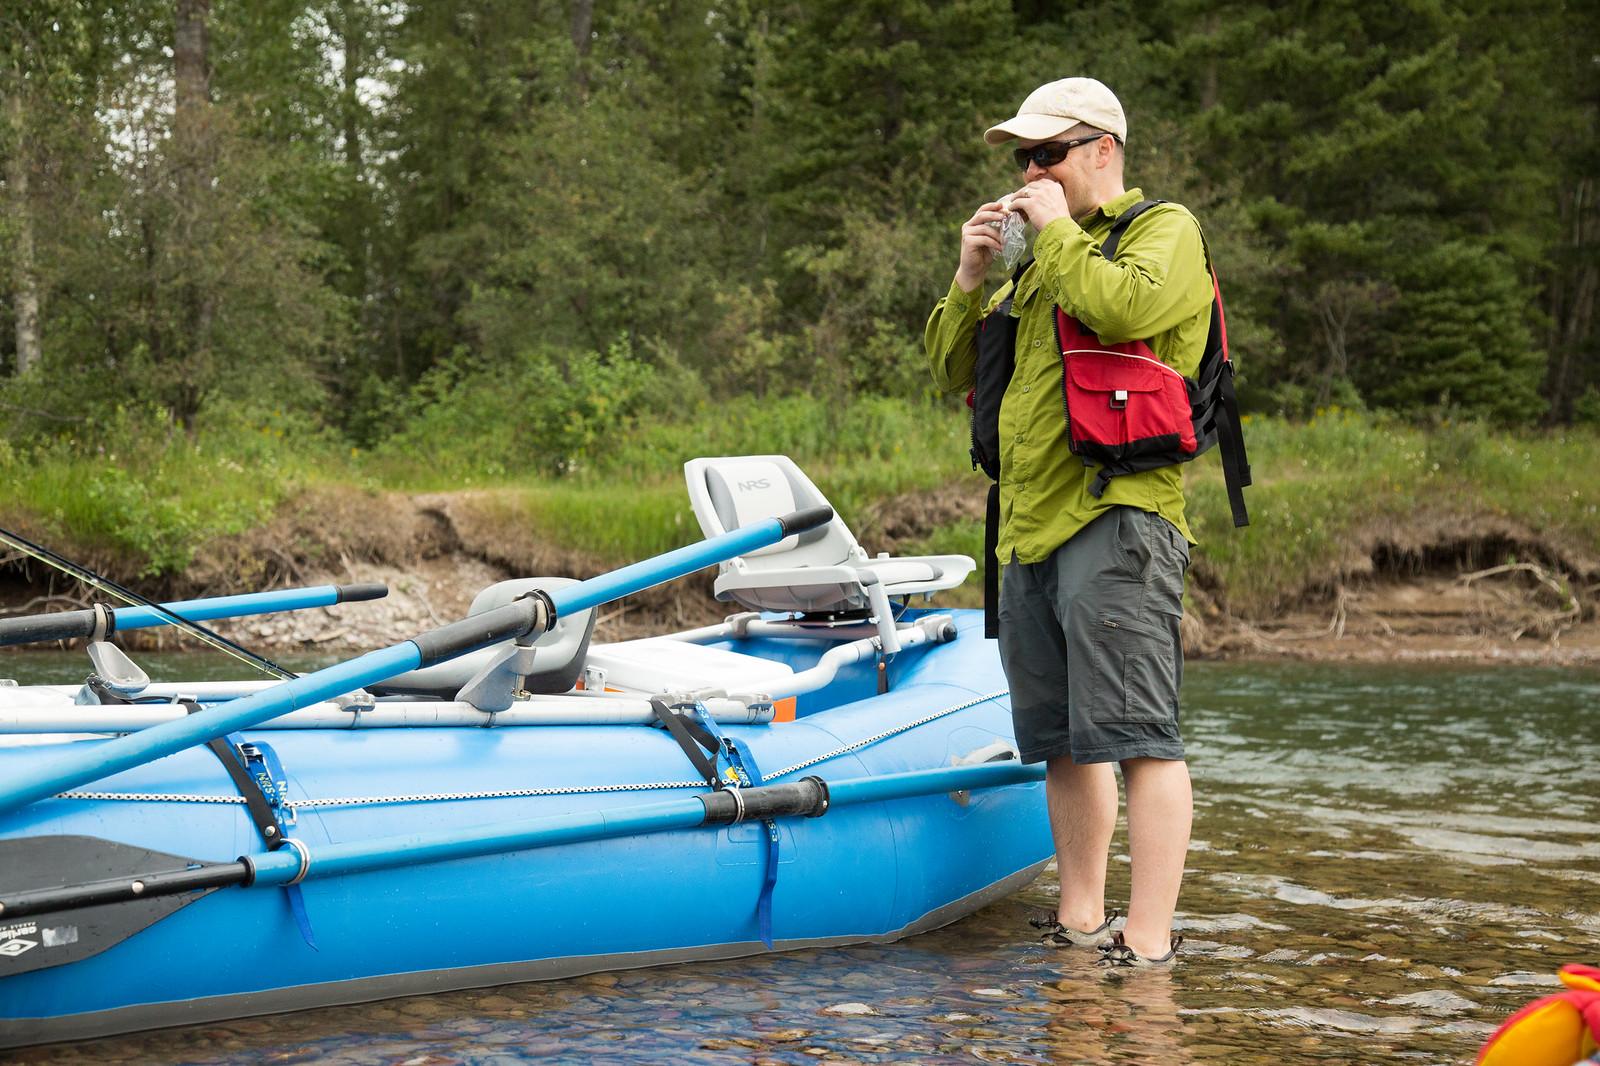 2015-07-10 Whitefish KOA and Float-9986.jpg